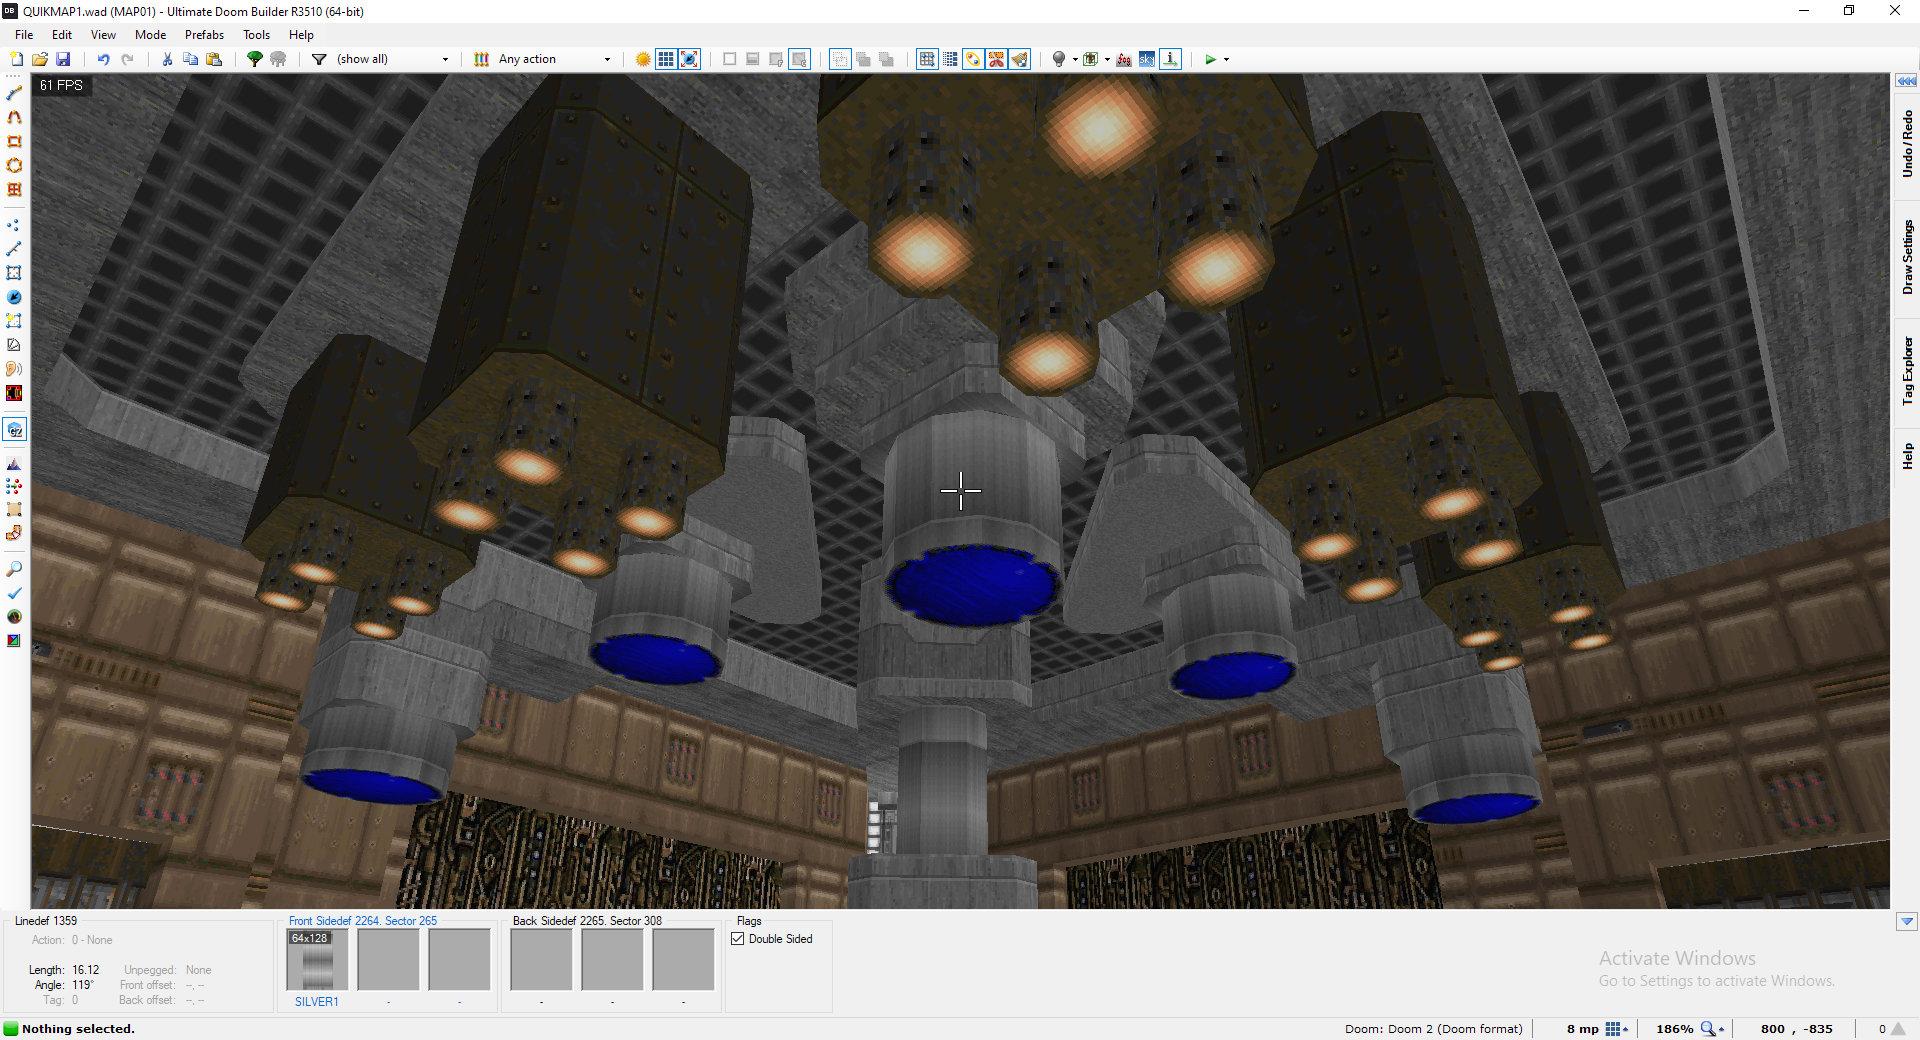 ceiling.jpg.9fb596a93a77e7d7e89d28f66400e7c0.jpg